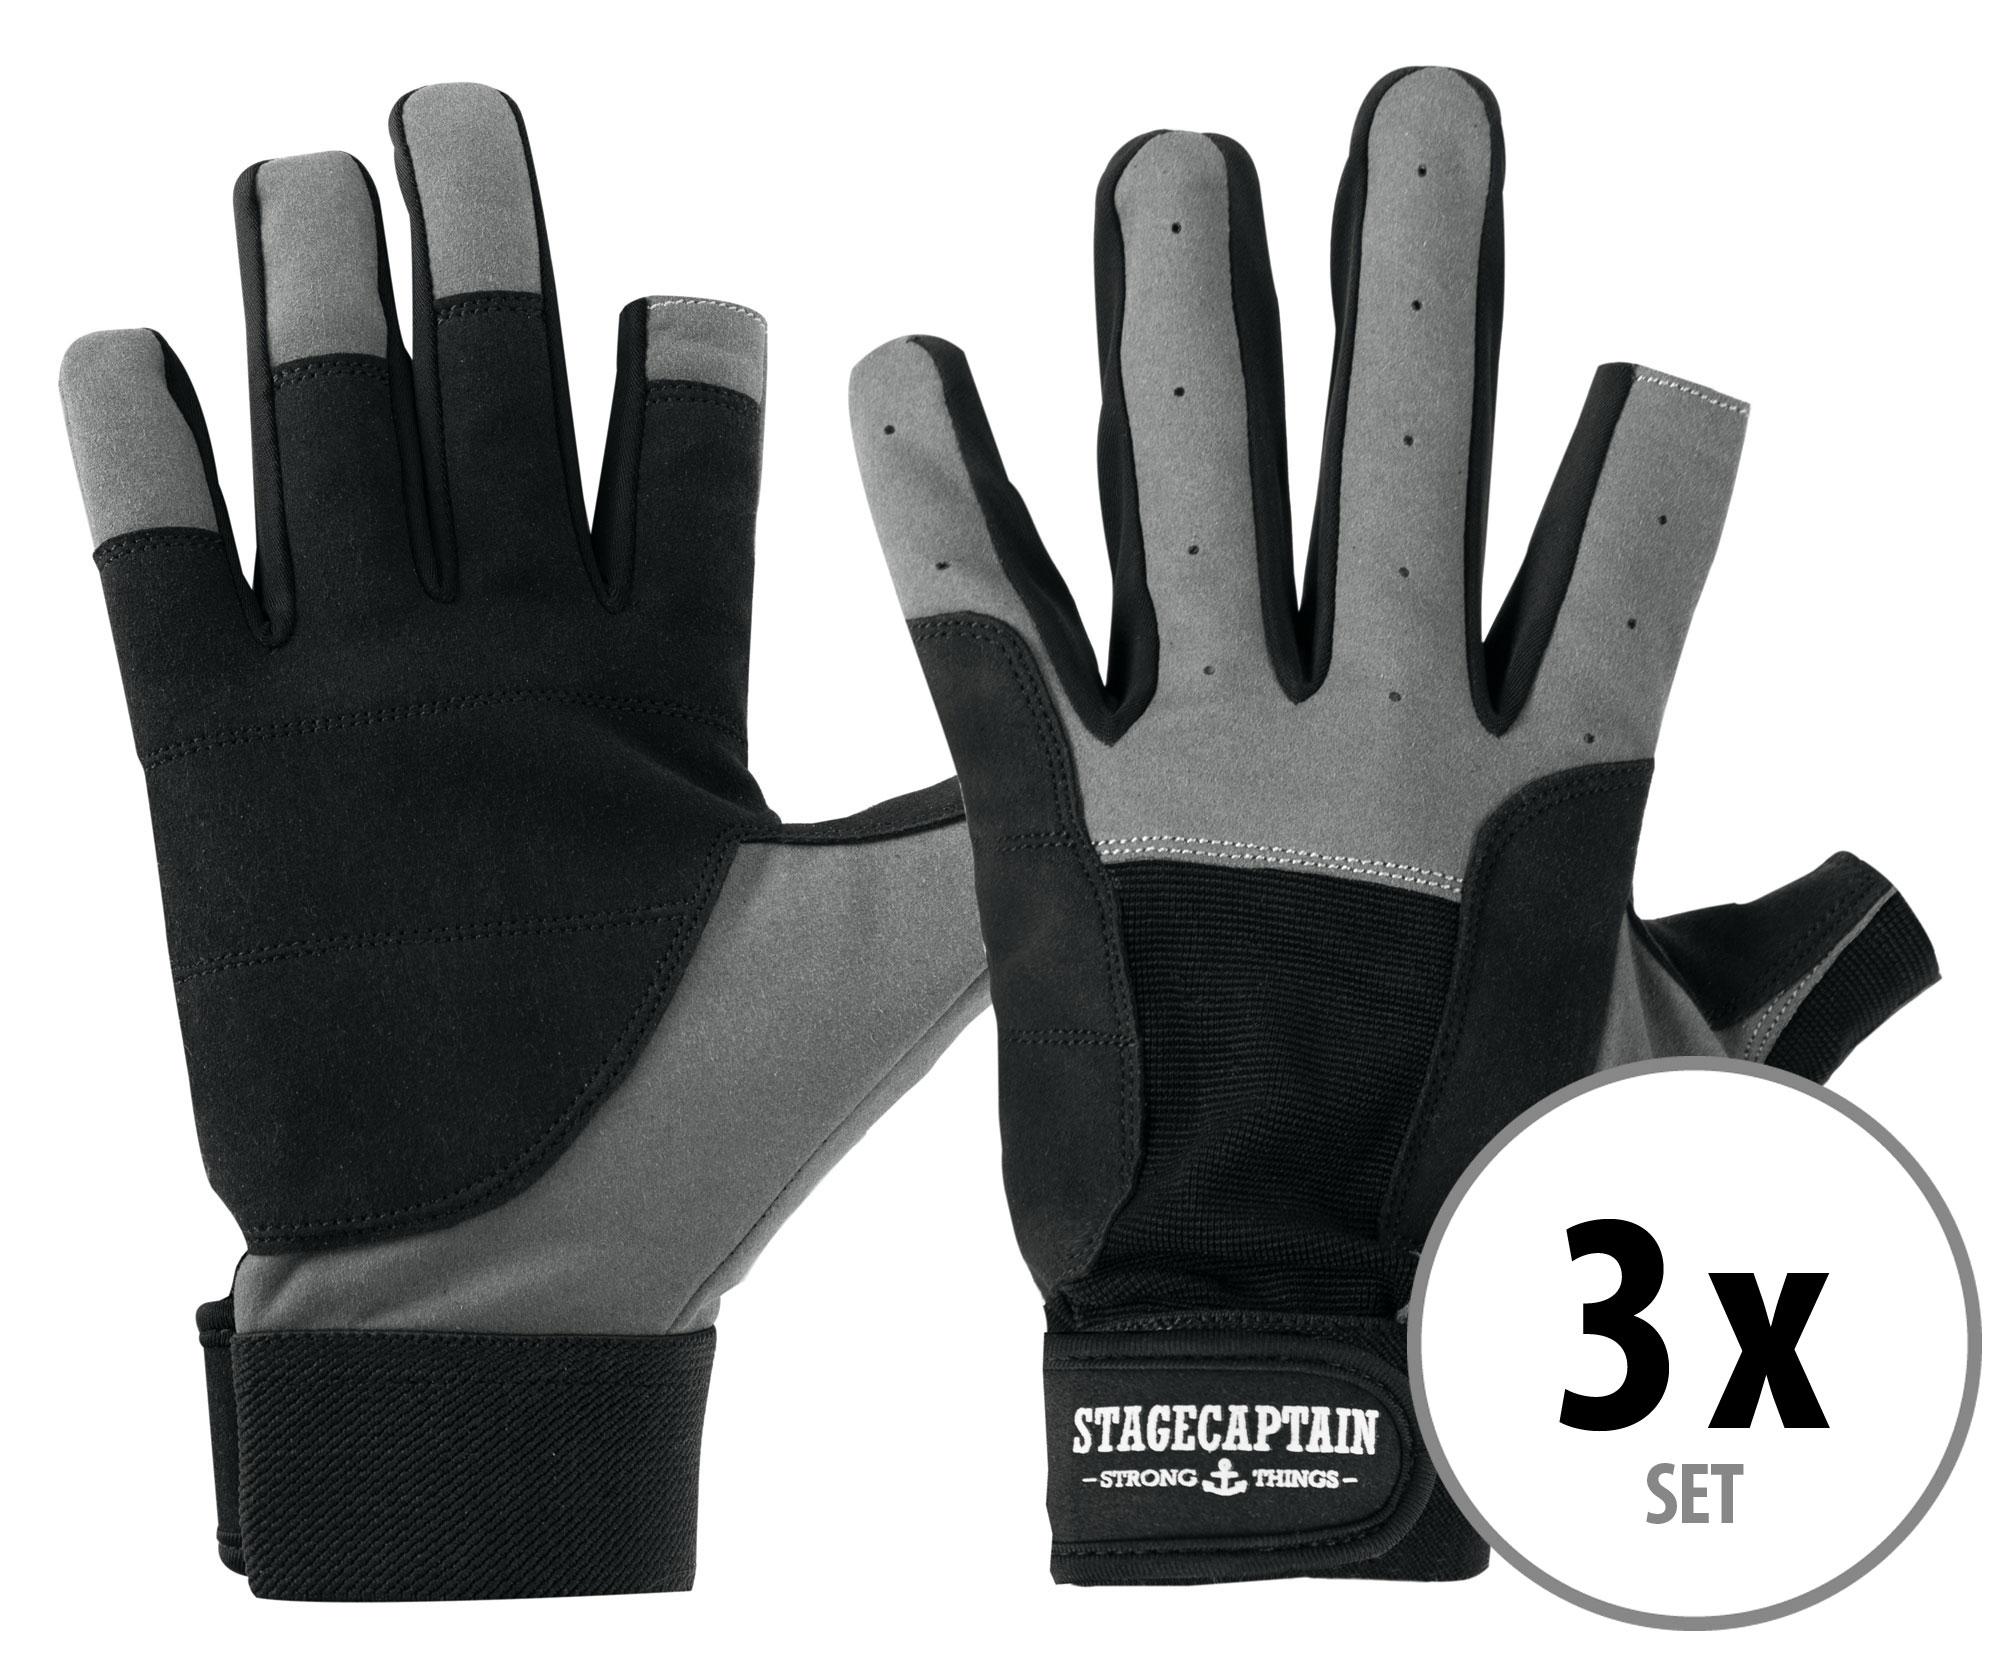 3er Set Stagecaptain Rigger Handschuhe M kurz